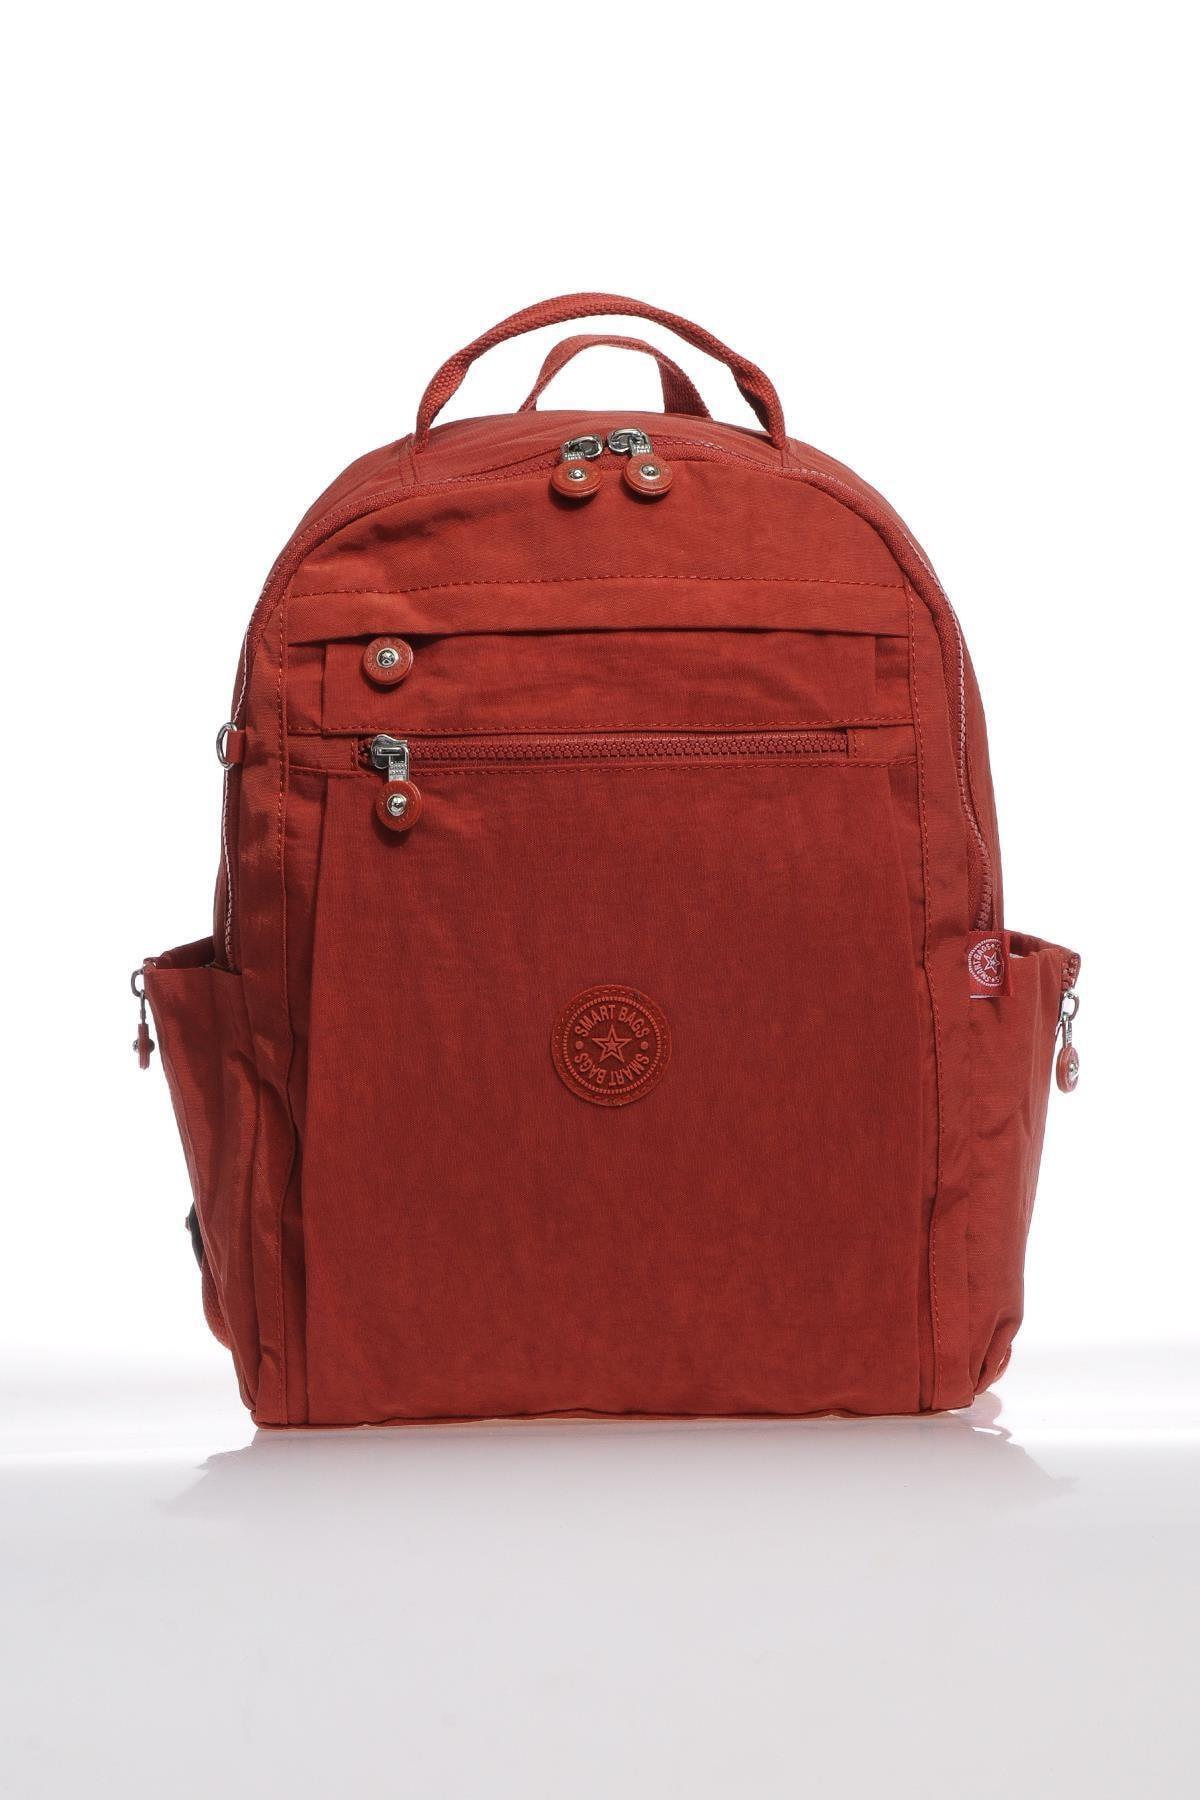 SMART BAGS Smb1247-0019 Kırmızı Kadın Sırt Çantası 1